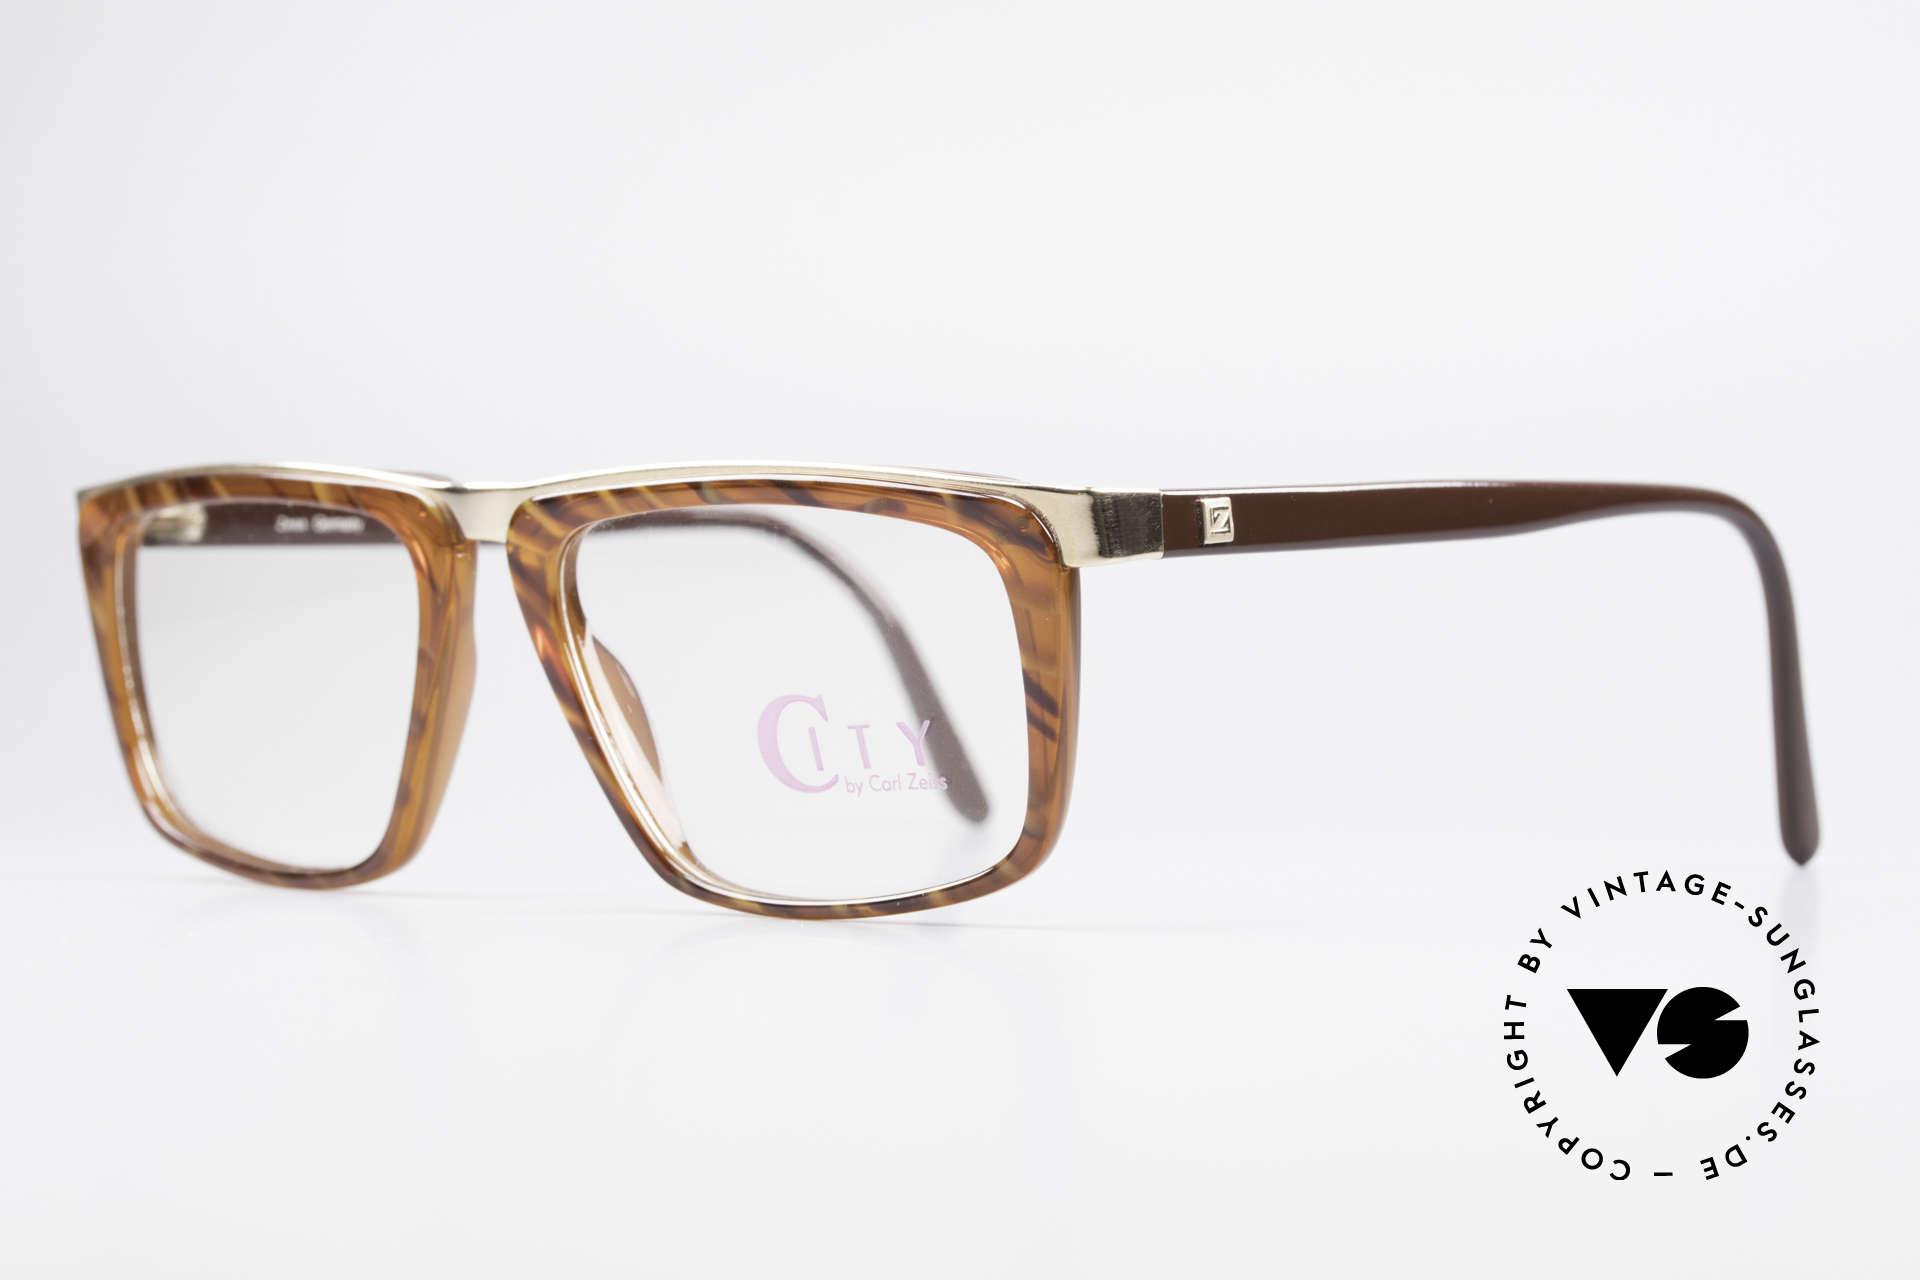 Zeiss 5967 90's Titanium Eyeglasses Men, very elegant combination of materials, colors & forms, Made for Men